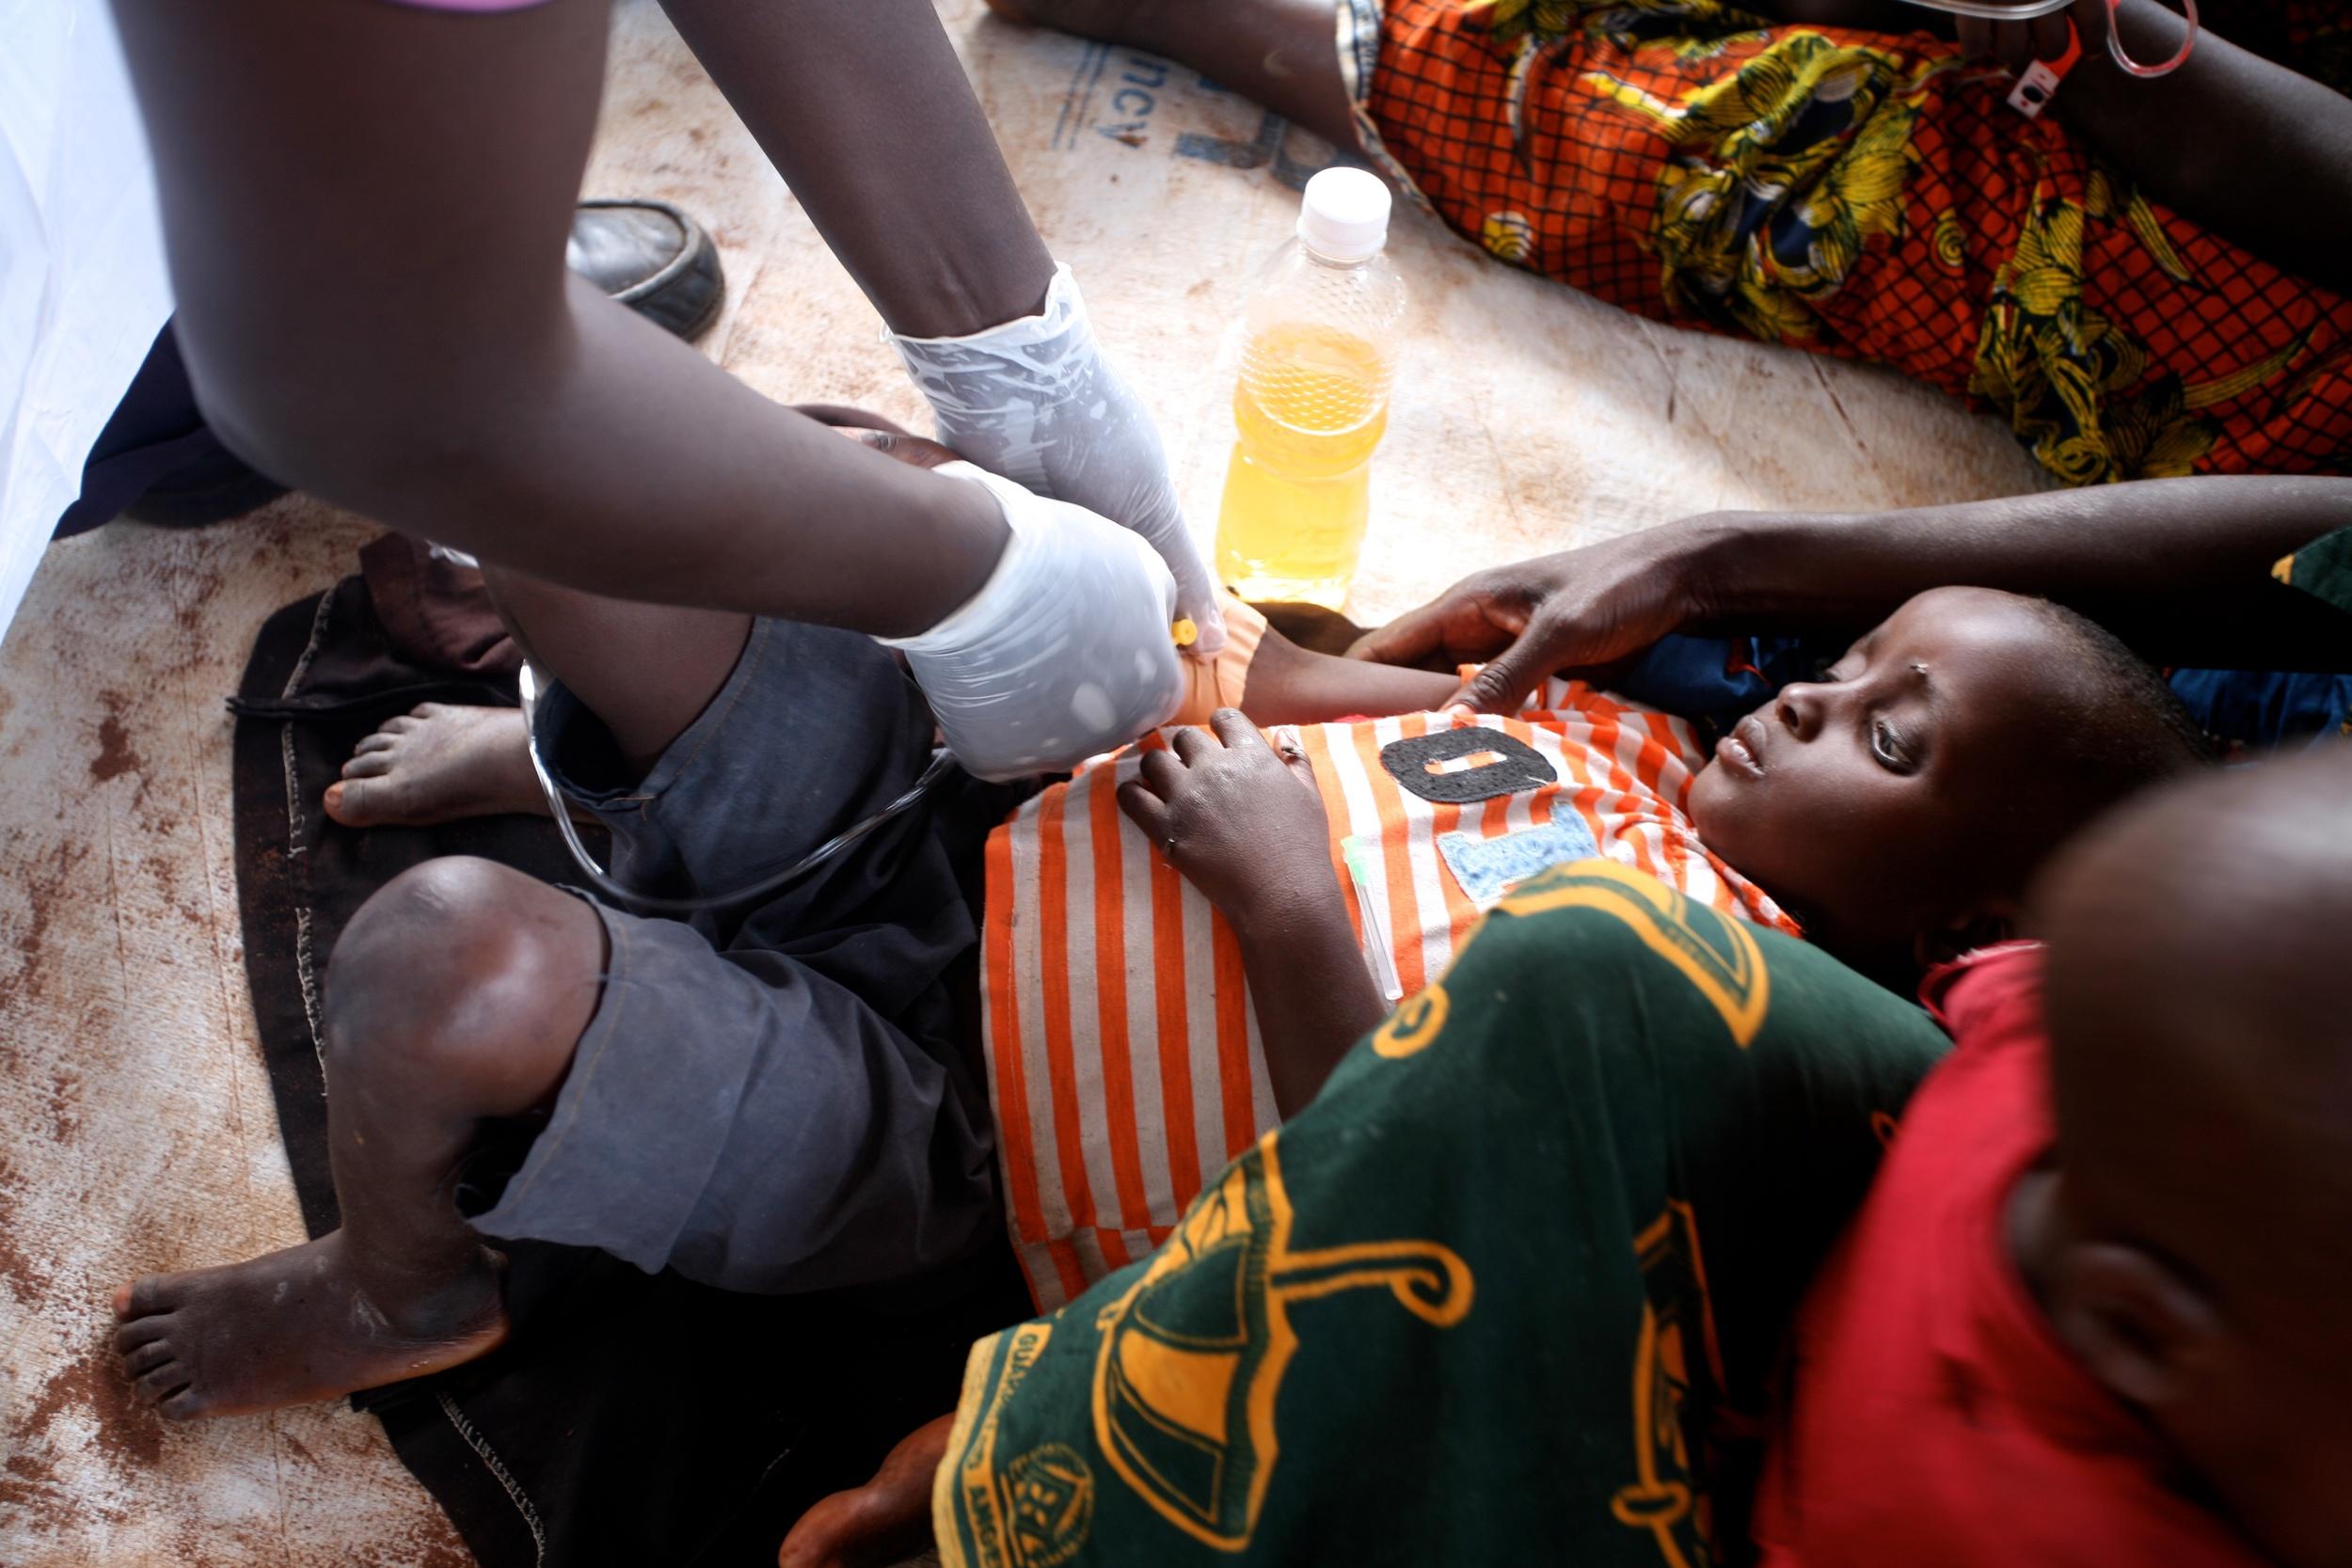 ABurundian refugeesuspected of havingcholera receives IV rehydration in the health clinic at Lake Tanganyika Stadium in Kigoma, Tanzania.